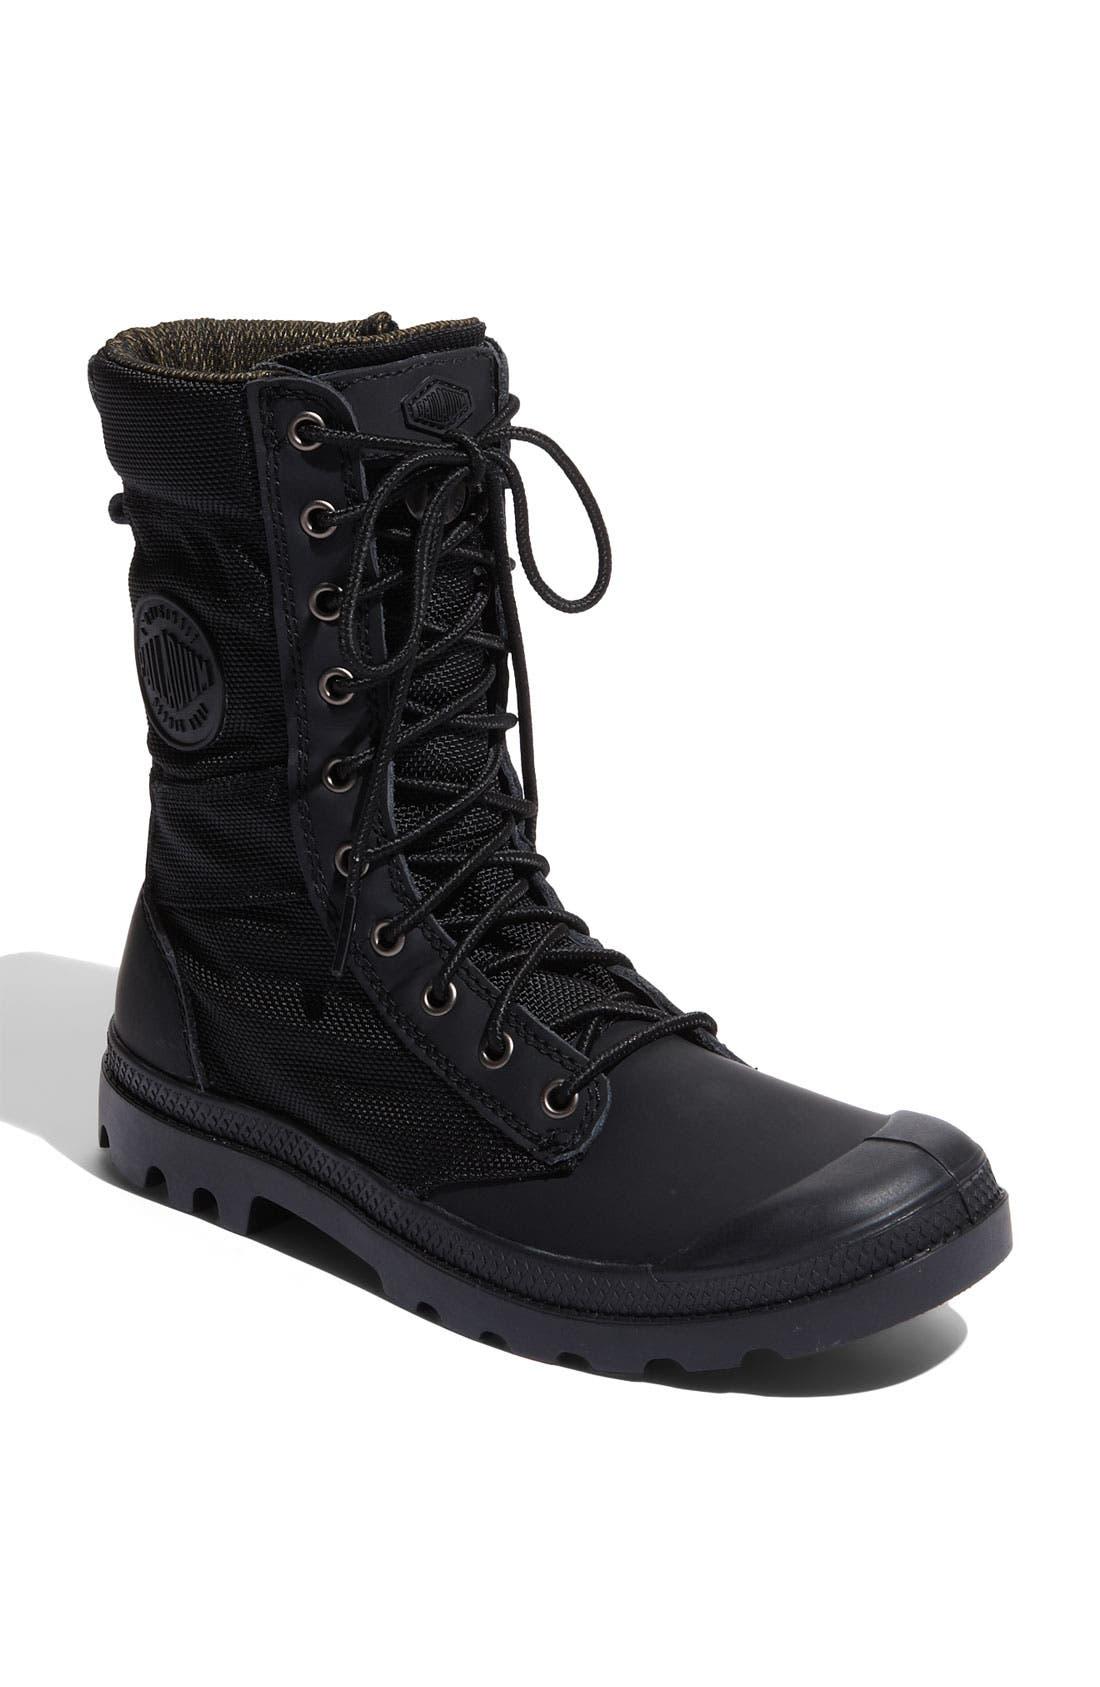 Alternate Image 1 Selected - Palladium 'Pampa' Tactical Boot